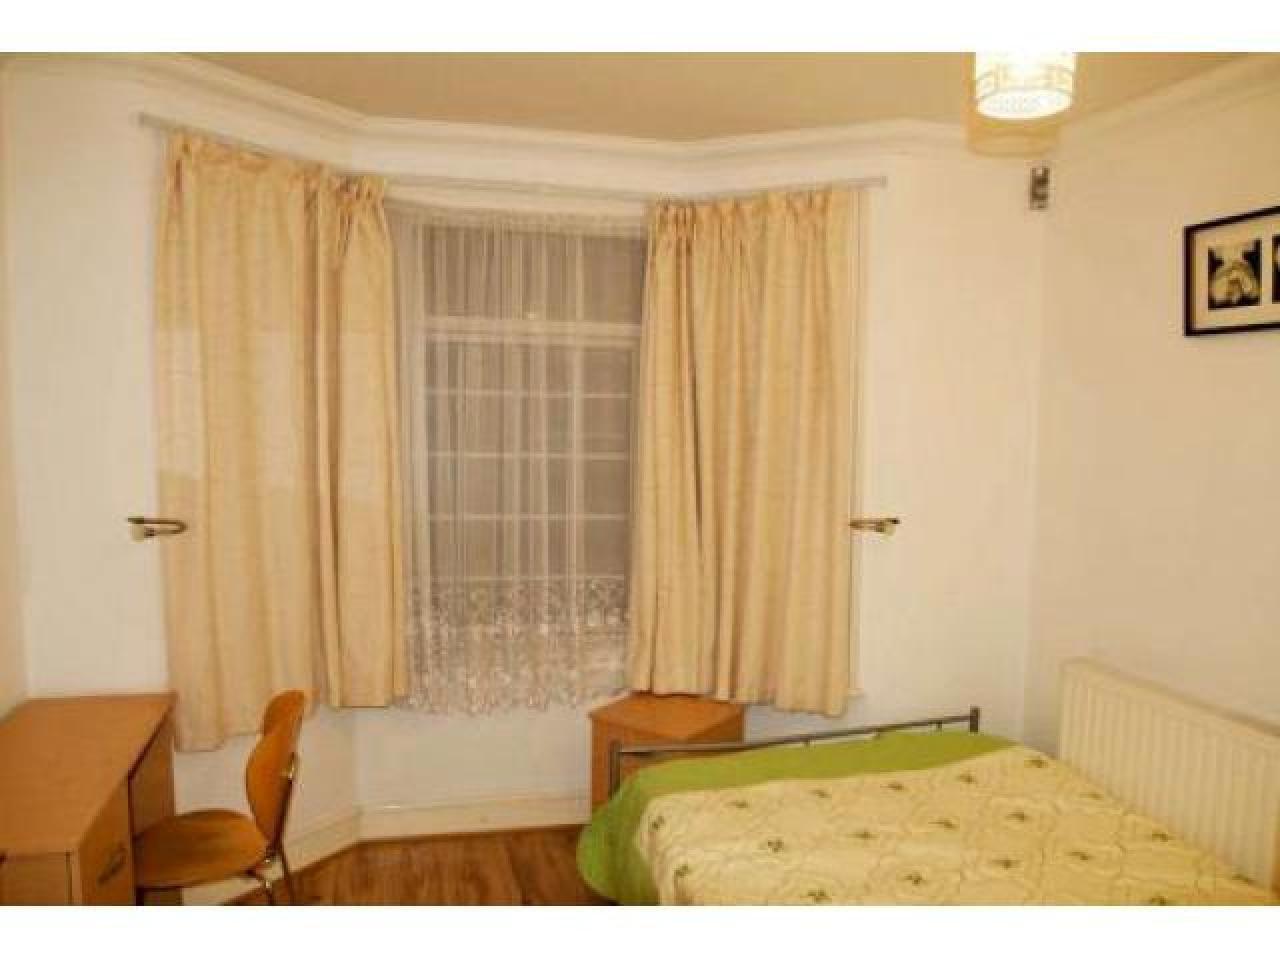 Комната для одного на Walthamstow / Blackhorse road - 2